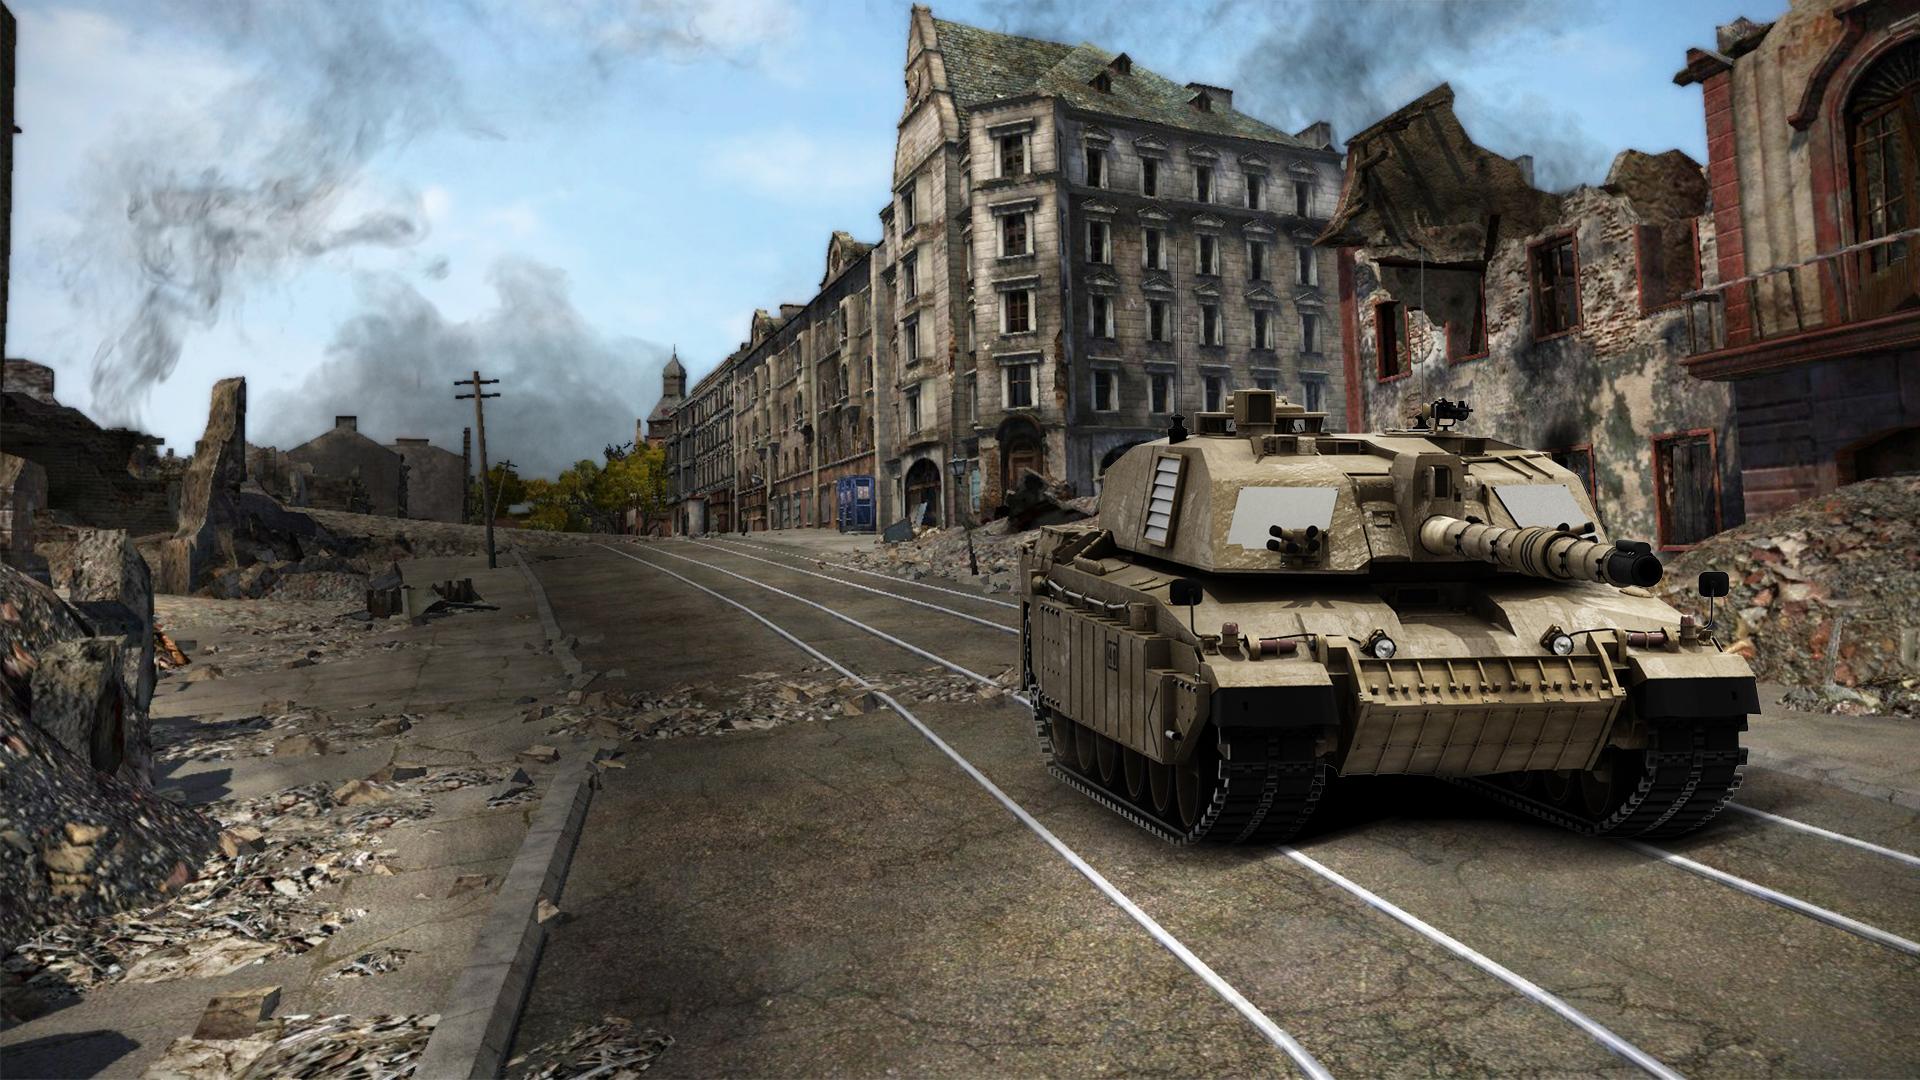 挑战者2 英国MBT 主力战斗坦克 Challenger-II-British-MBT-Main-Battle-Tank